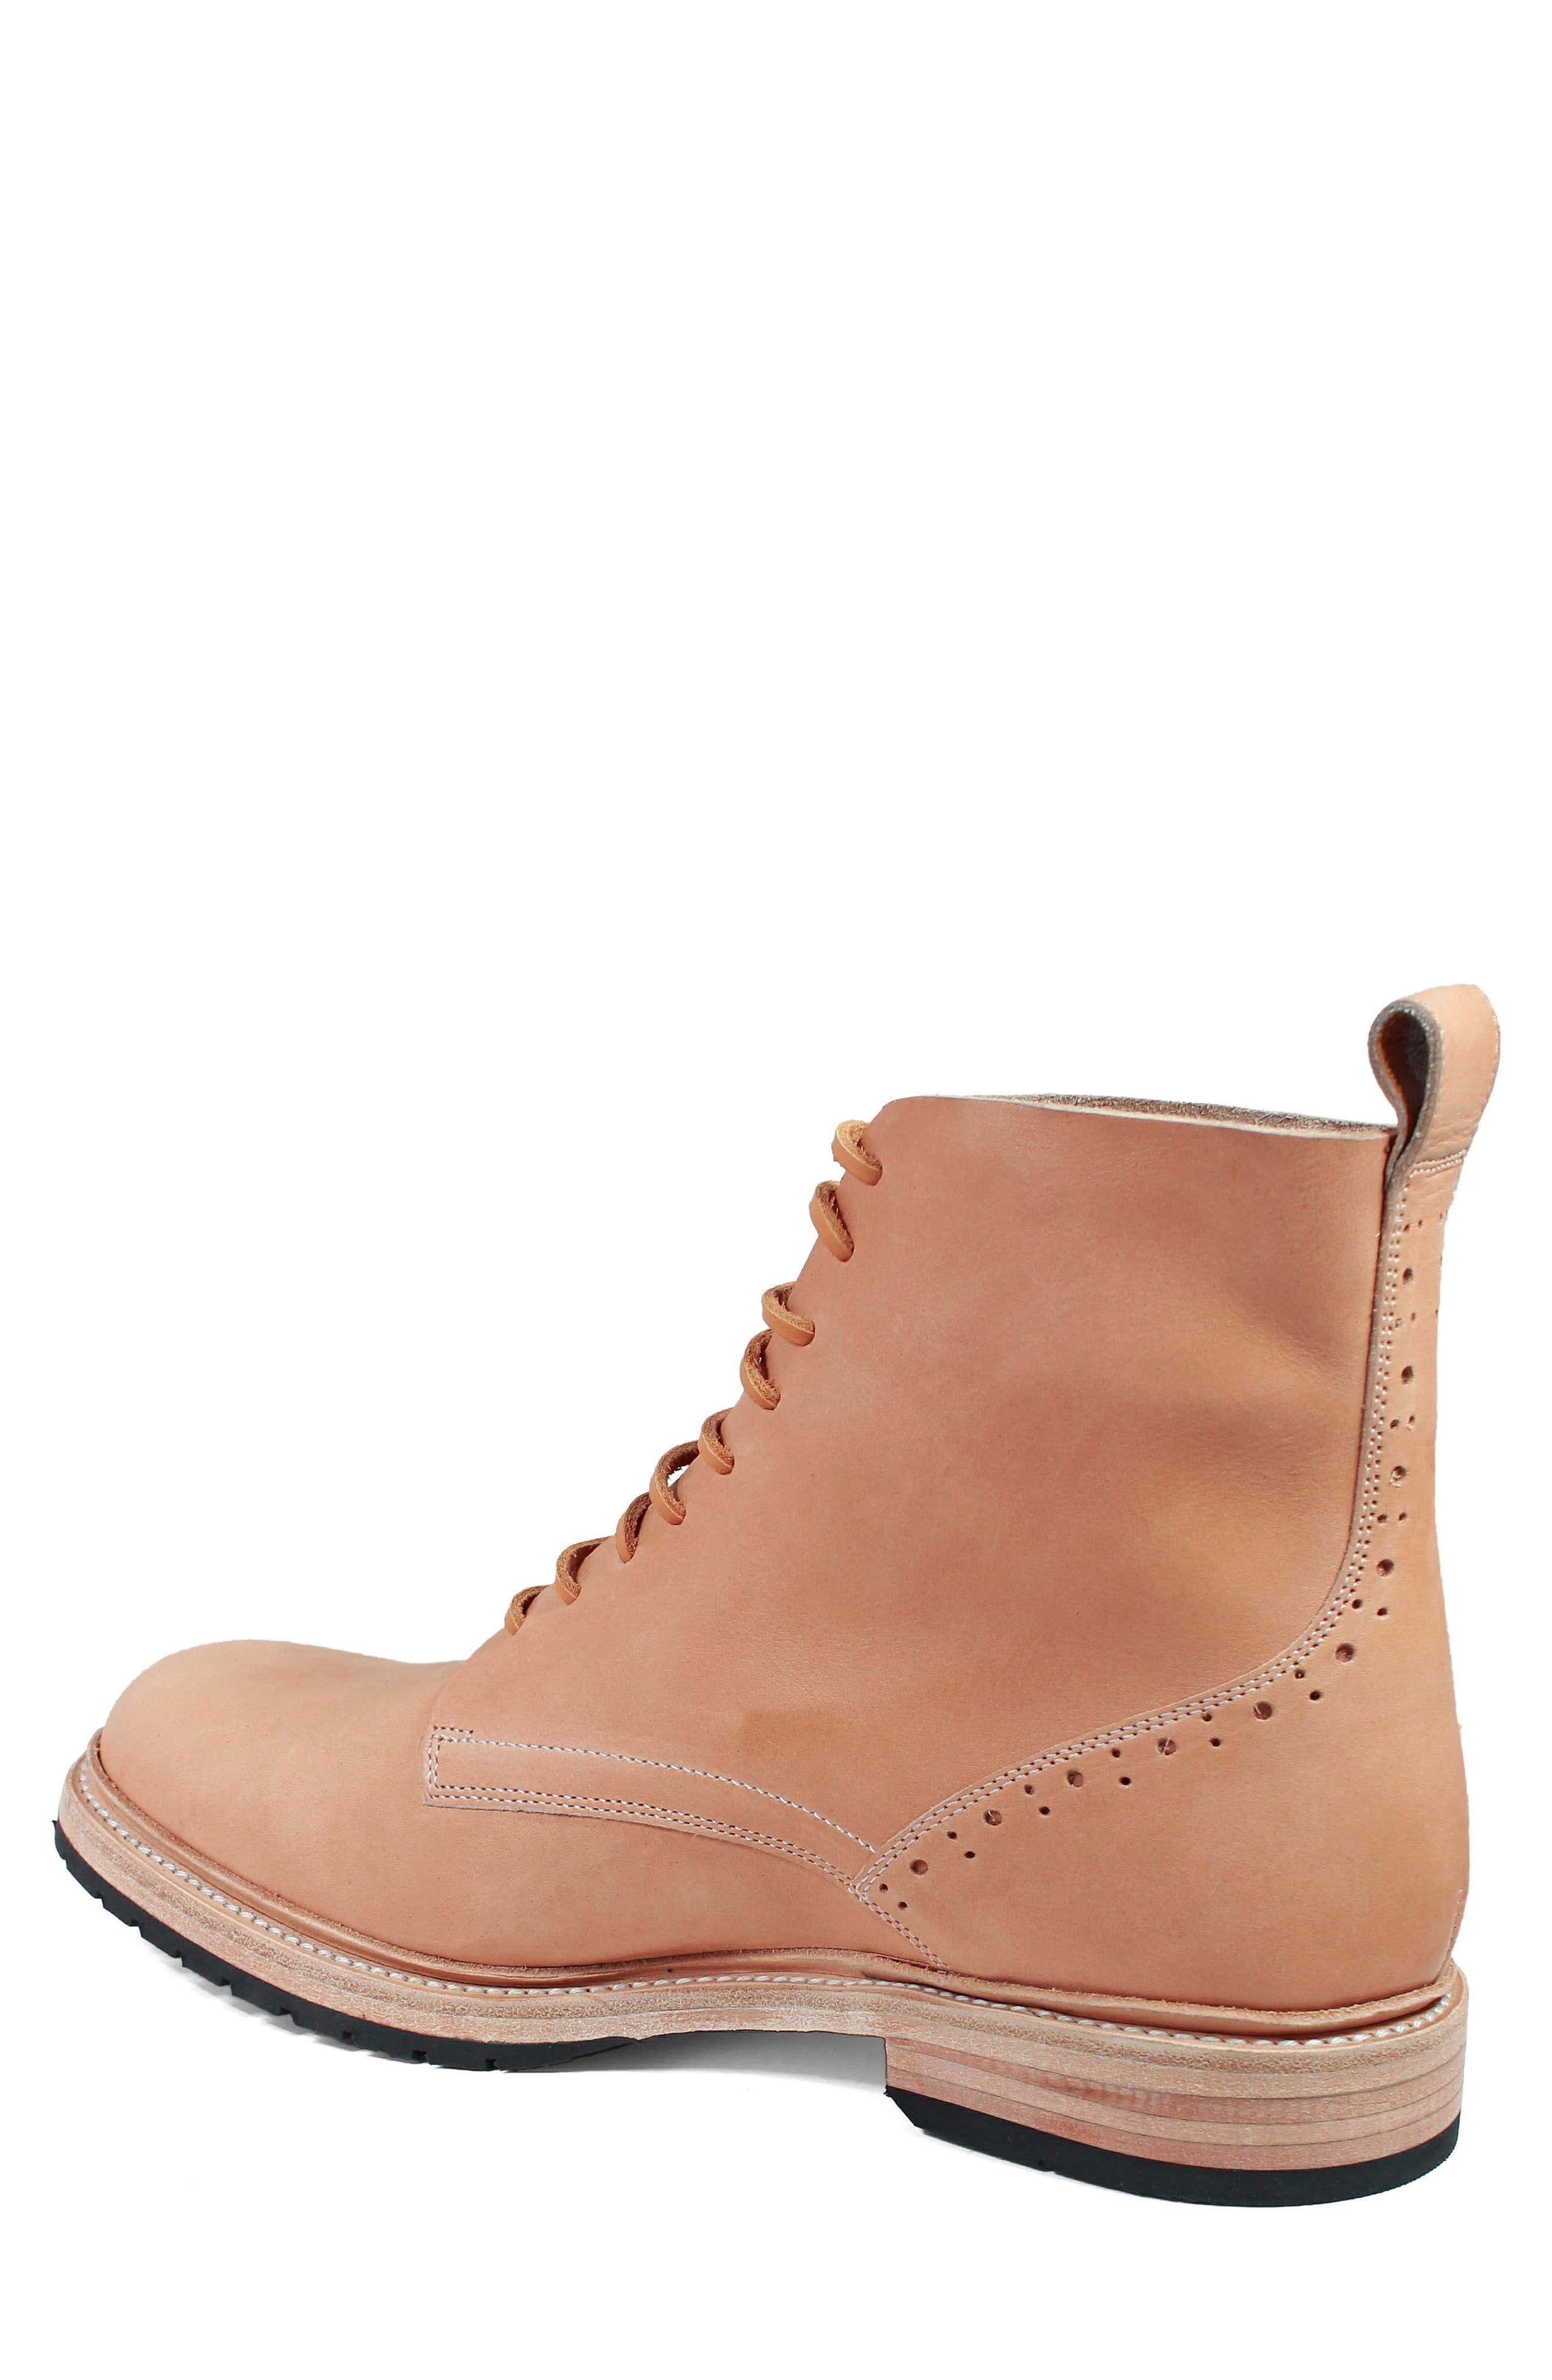 M2 Plain Toe Boot,                             Alternate thumbnail 2, color,                             Natural Leather